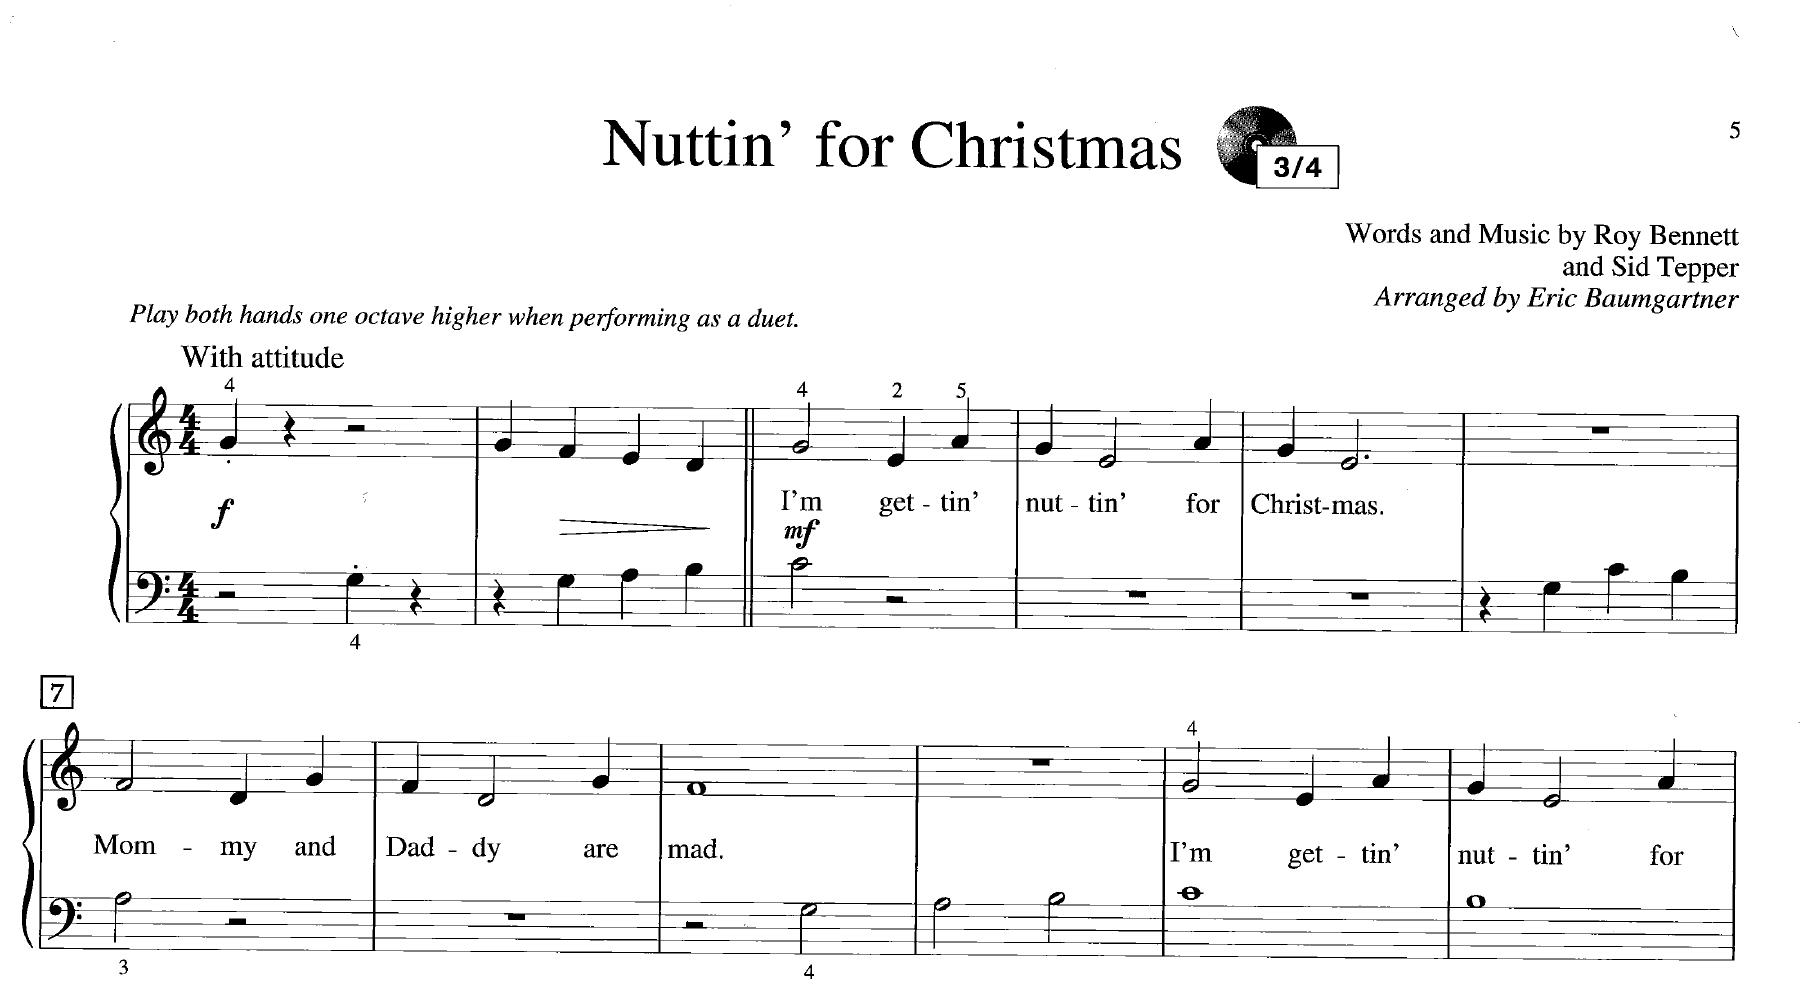 nuttin for christmas sheet music - Heart.impulsar.co